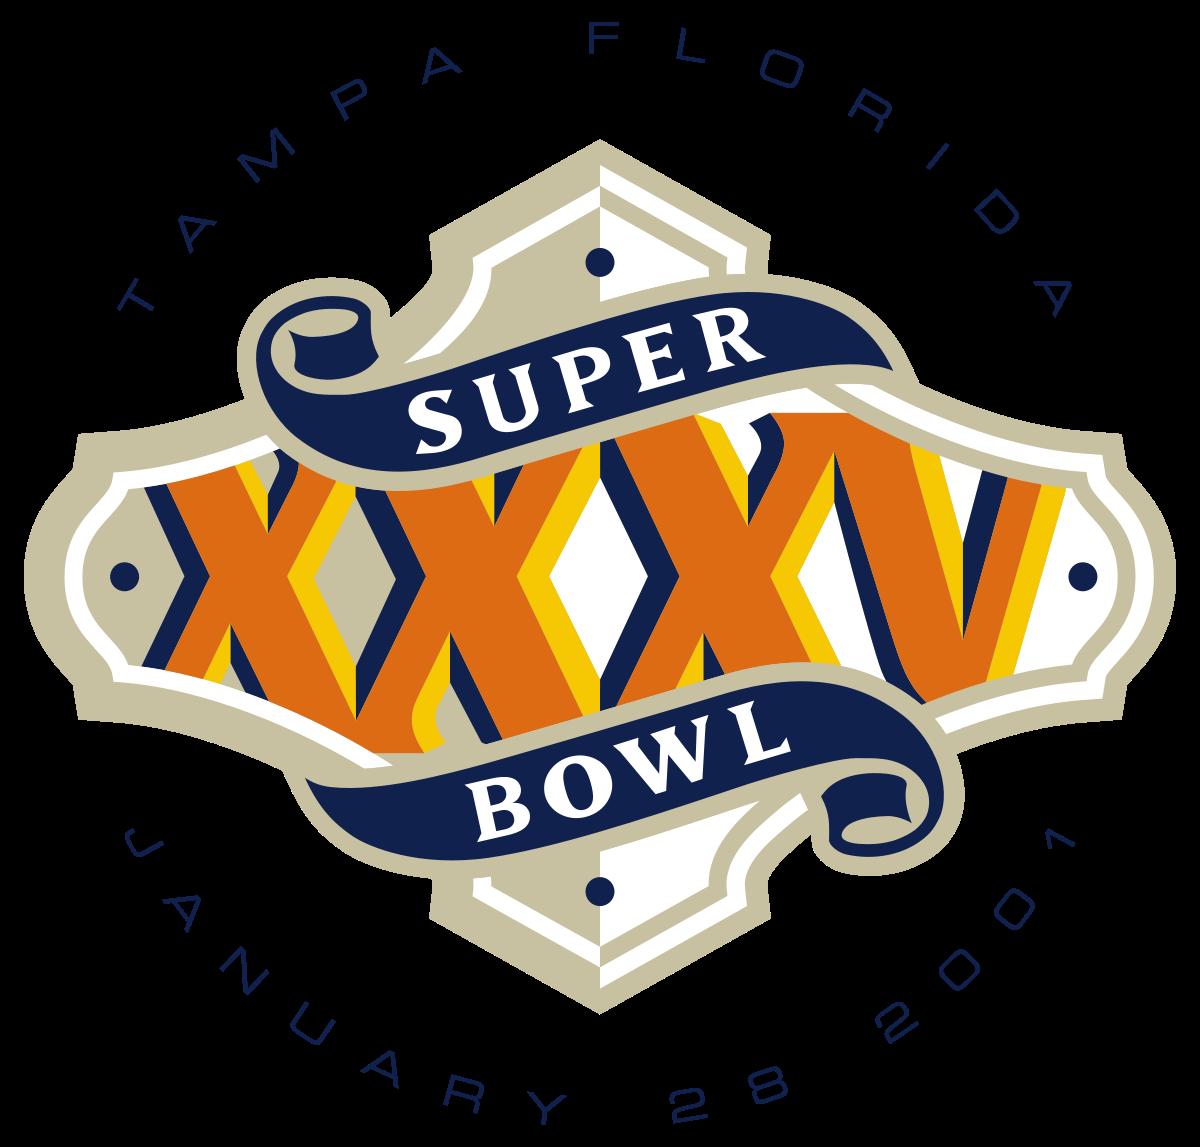 Football super bowl clipart jpg royalty free download 18beautiful Super Bowl Clip Art - Clip arts & coloring pages jpg royalty free download